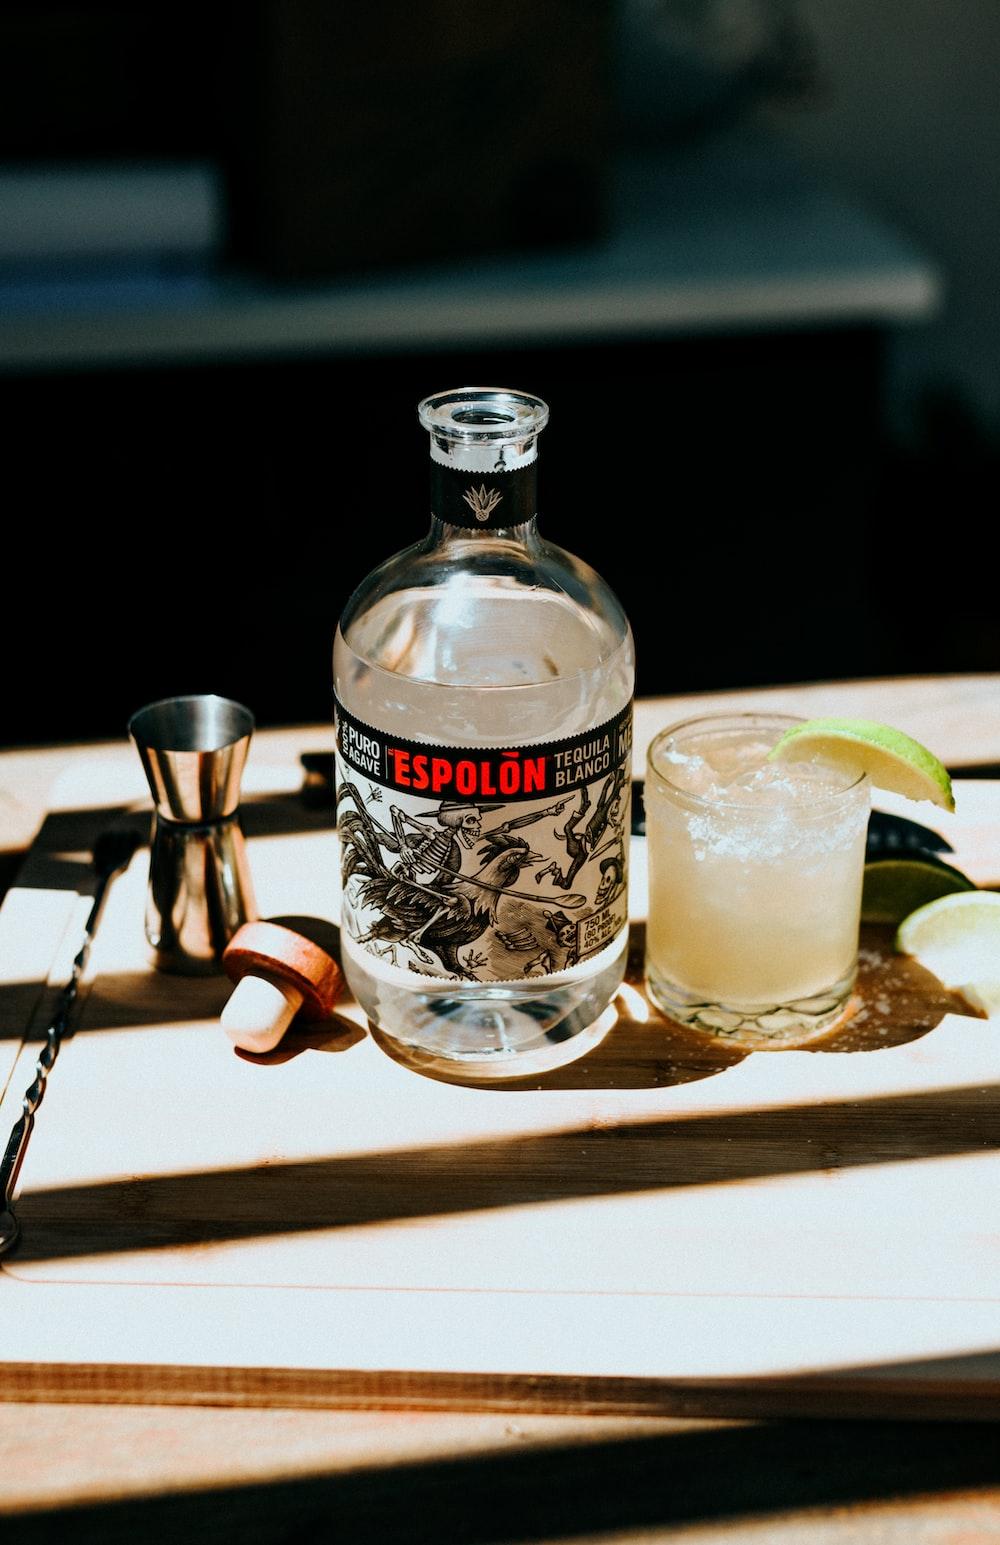 Espolòn Tequila bottle next to cocktail